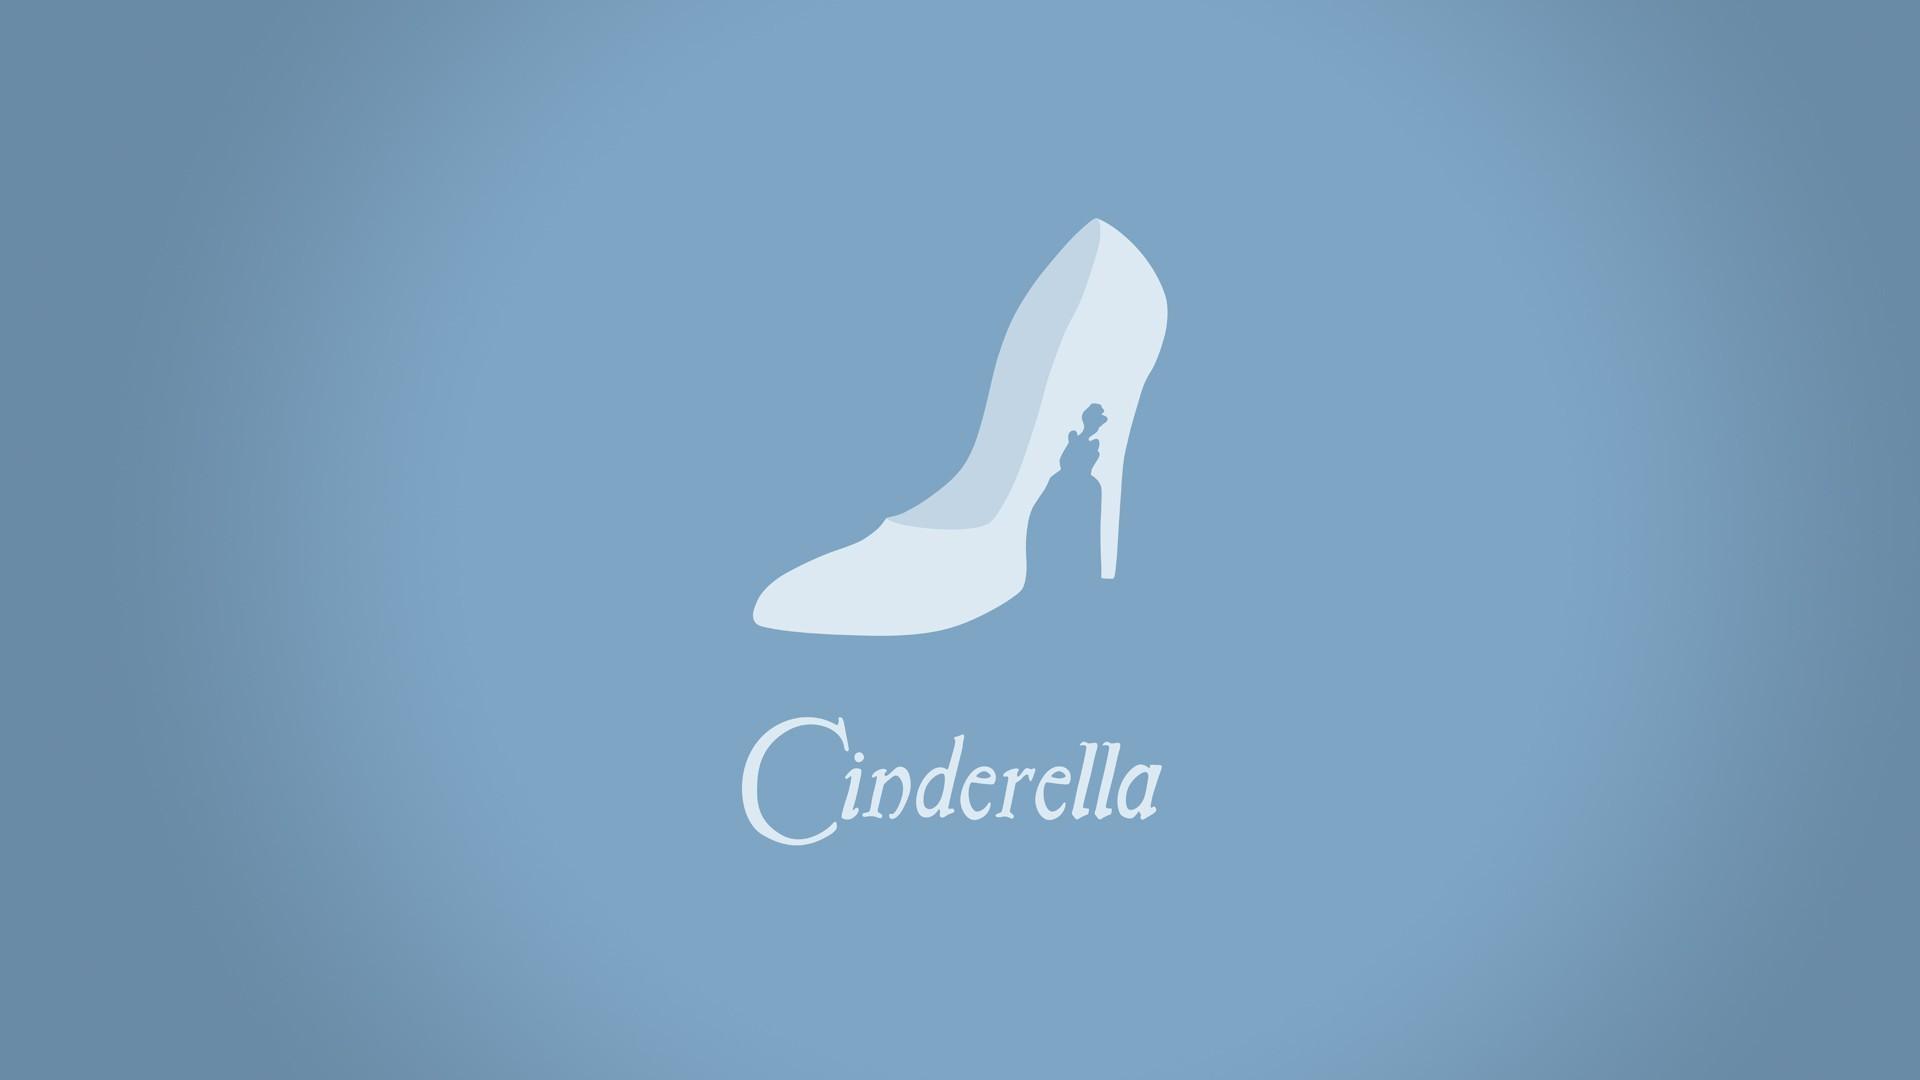 Disney cinderella wallpaper hd cinderella backgrounds altavistaventures Images